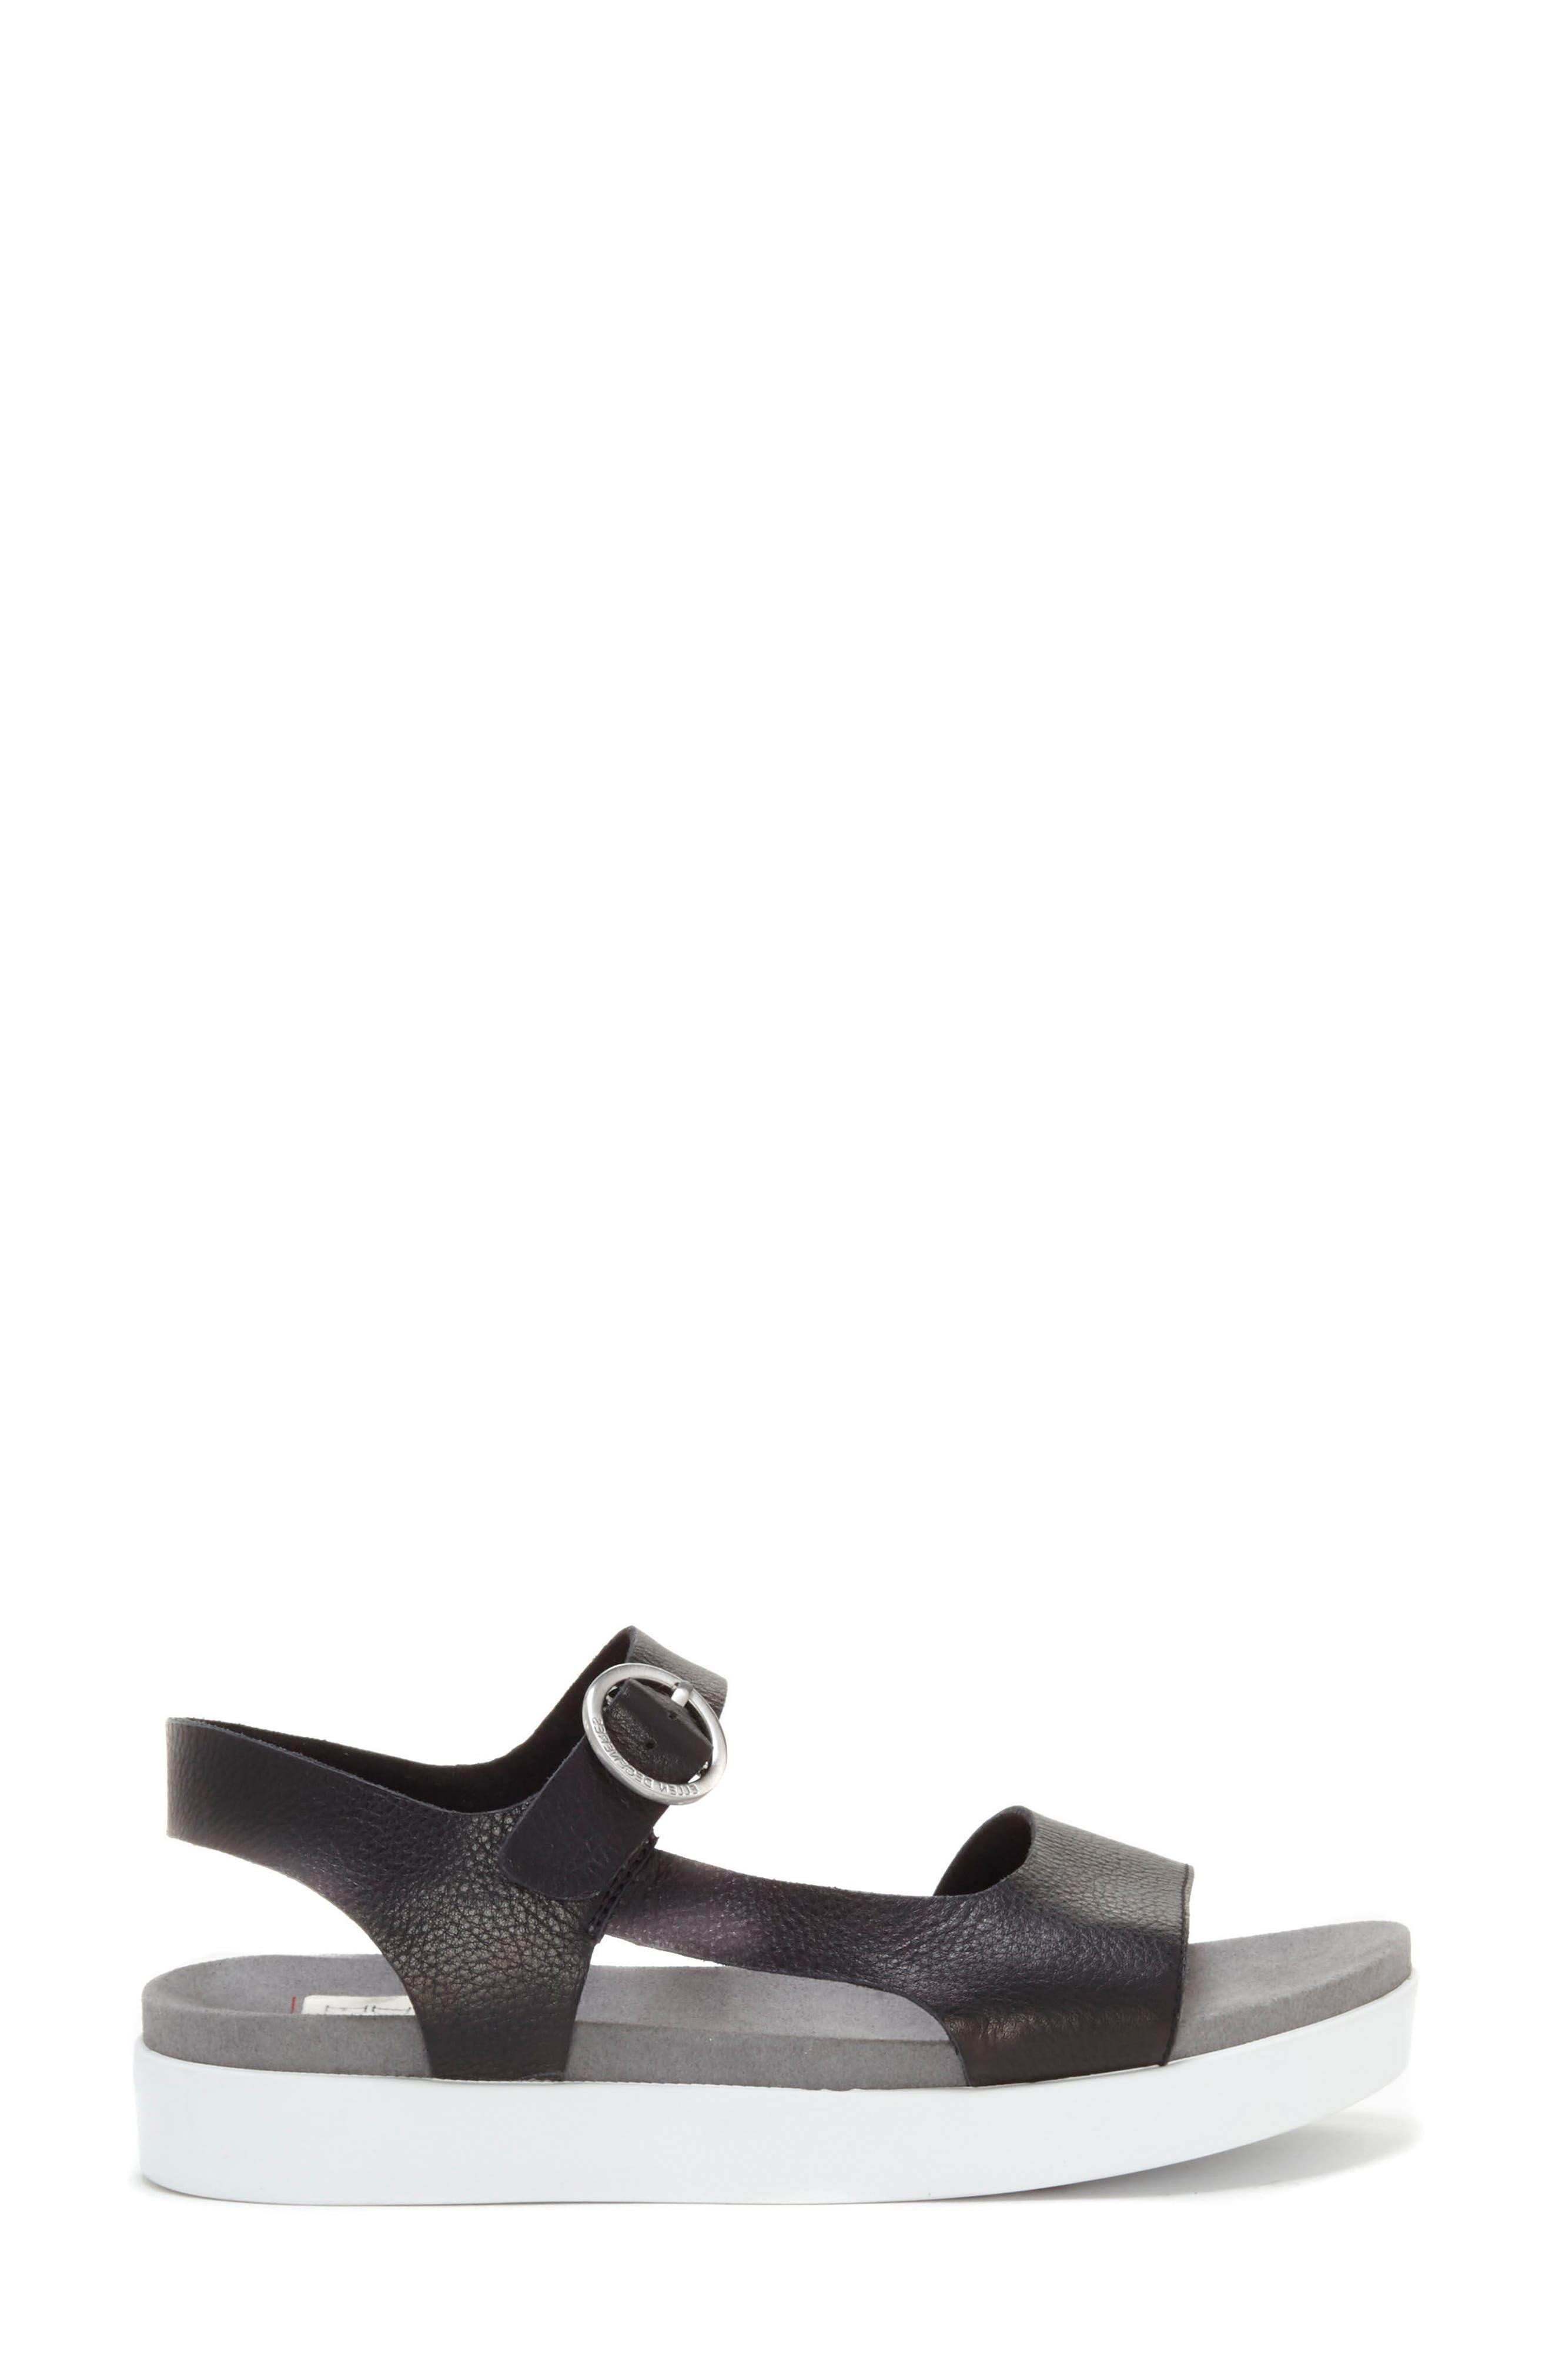 Caspin Sandal,                             Alternate thumbnail 4, color,                             Black Leather